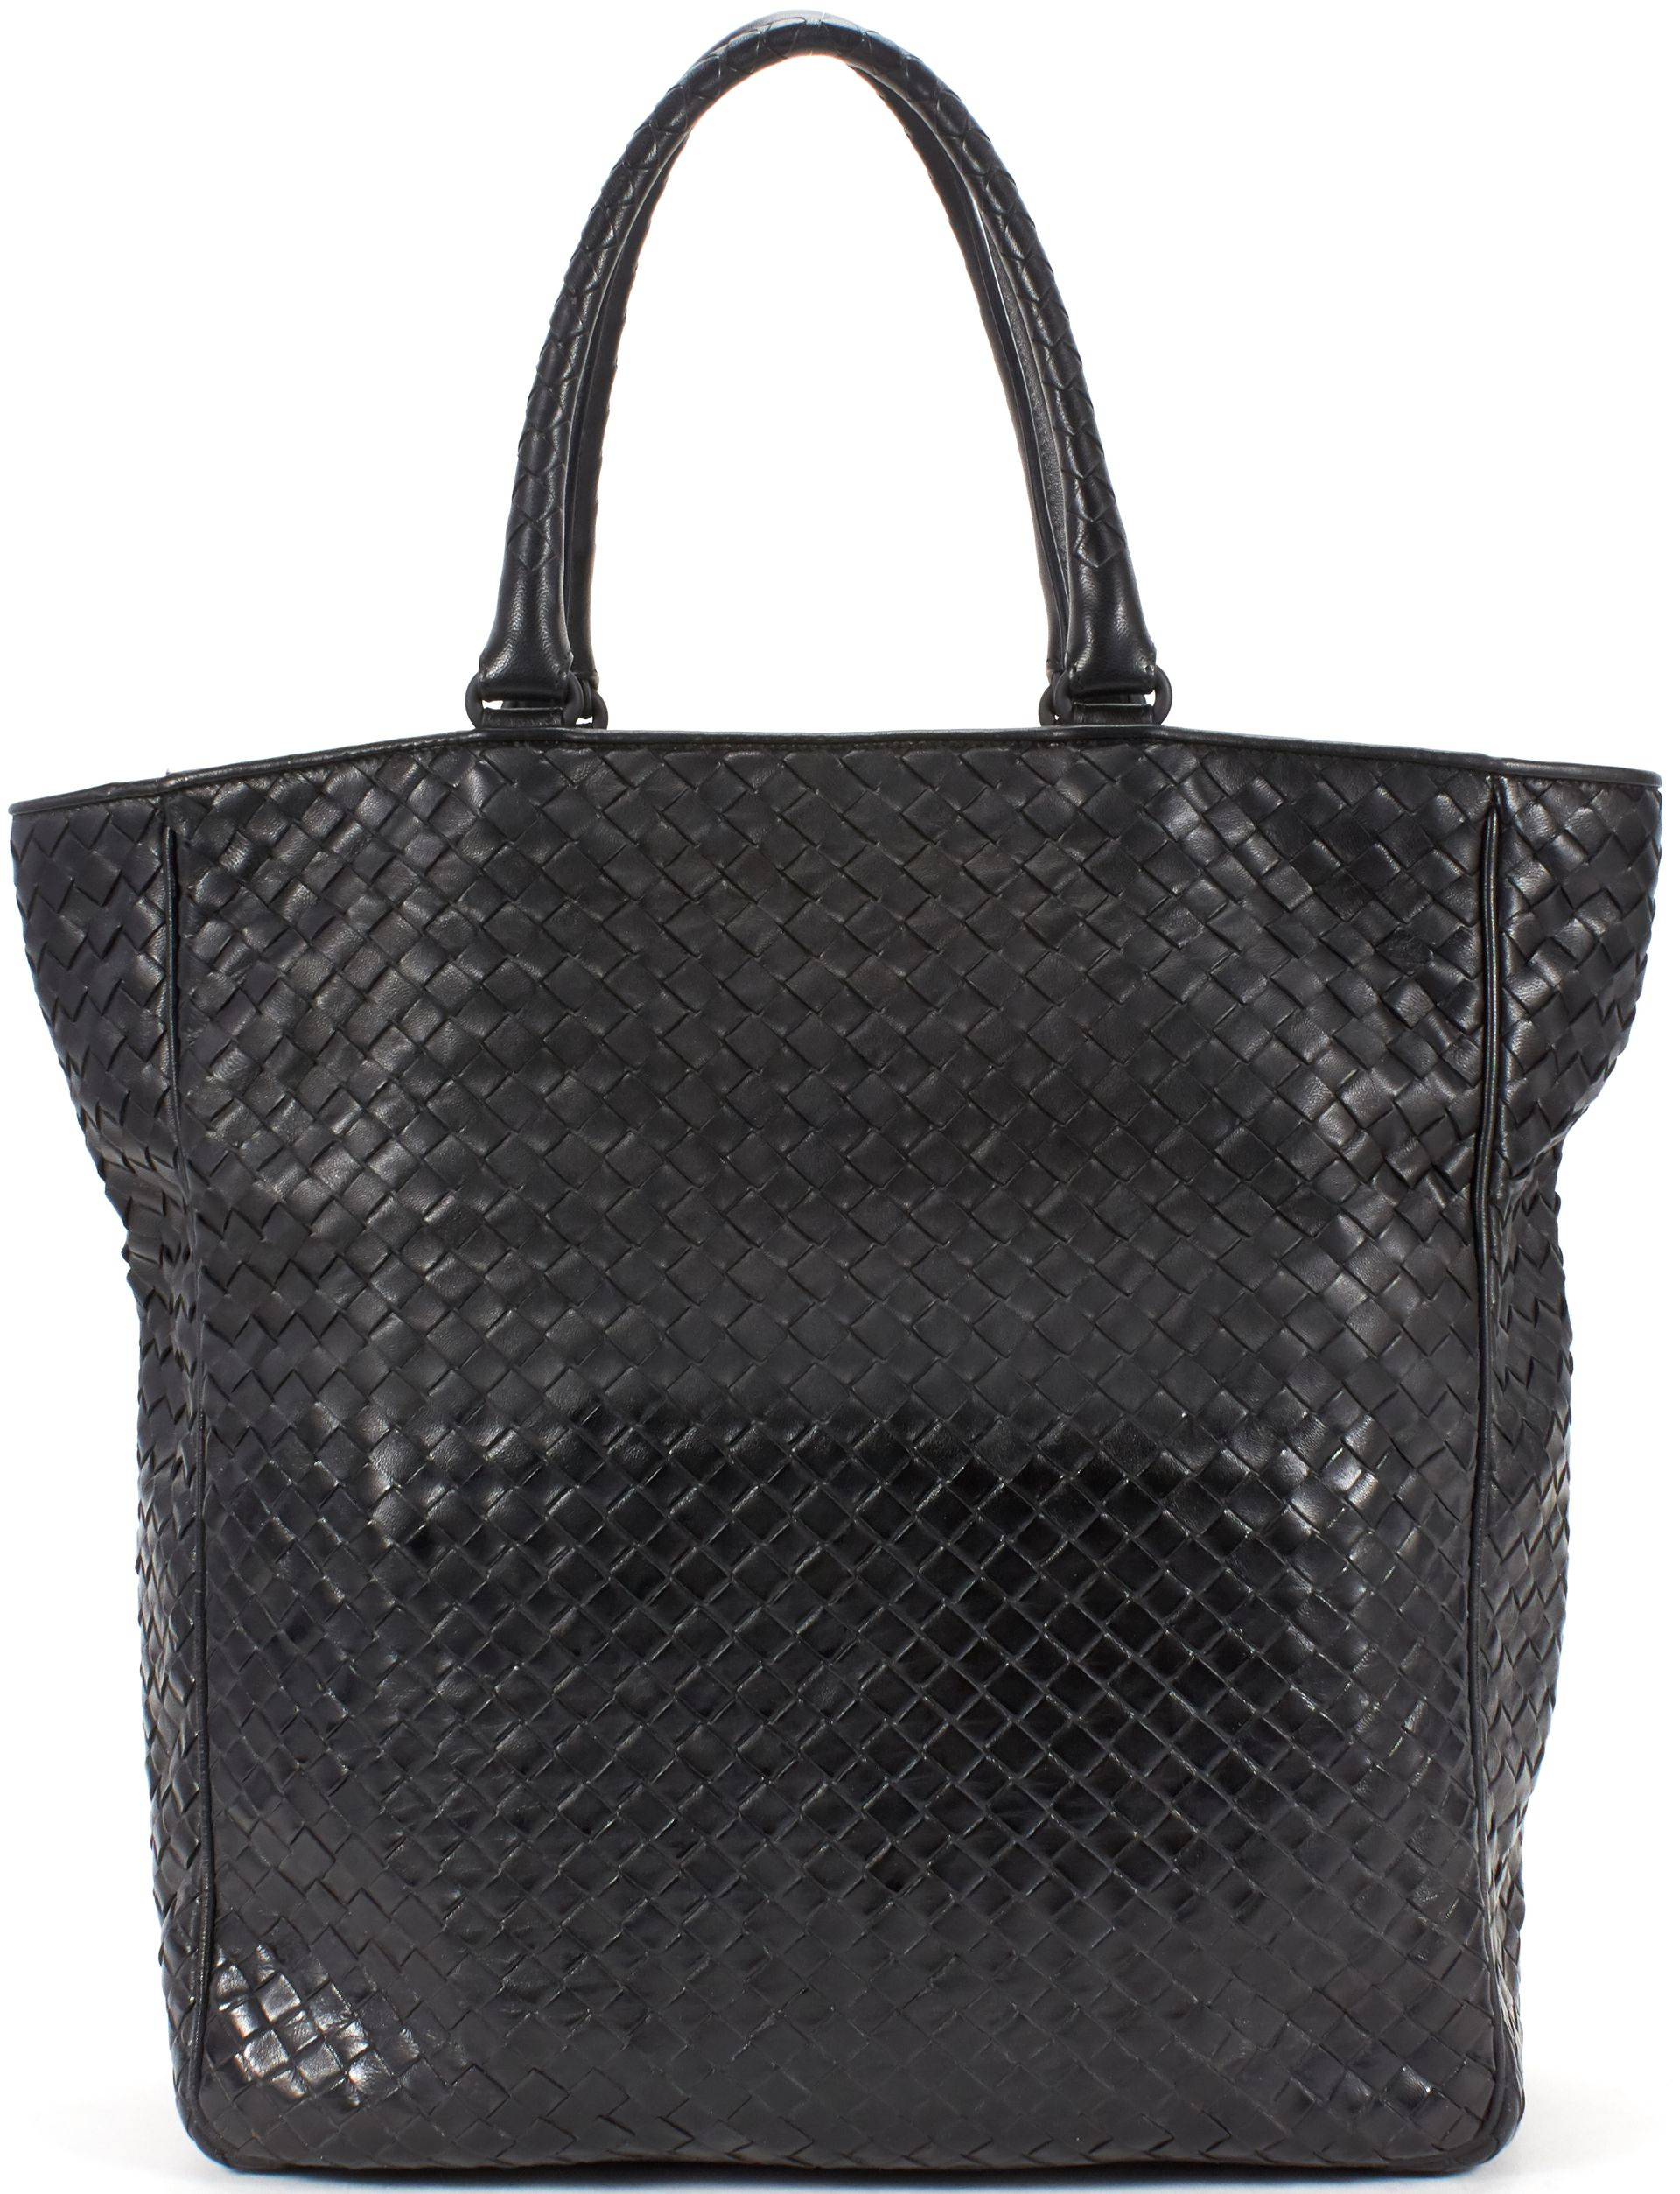 Bottega Veneta Black Intrecciato Woven Nappa Leather Large Tote ...